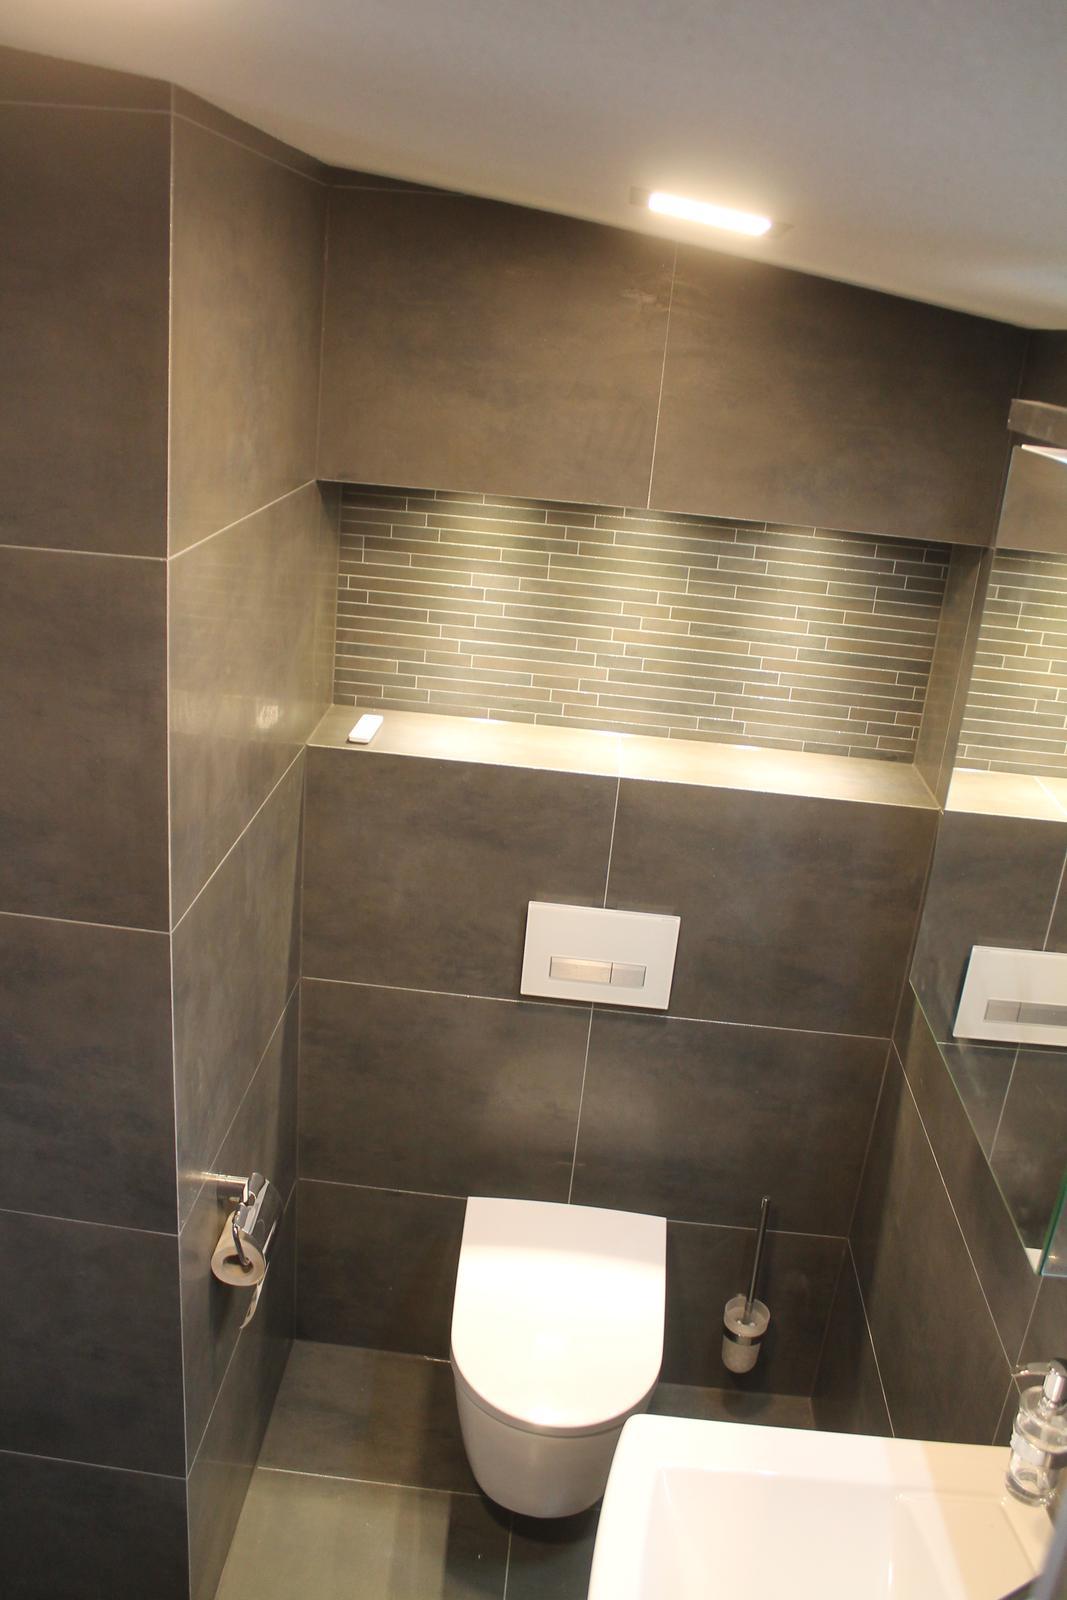 Rekonstrukcia wc Aqwaterm Nr - Obrázok č. 17